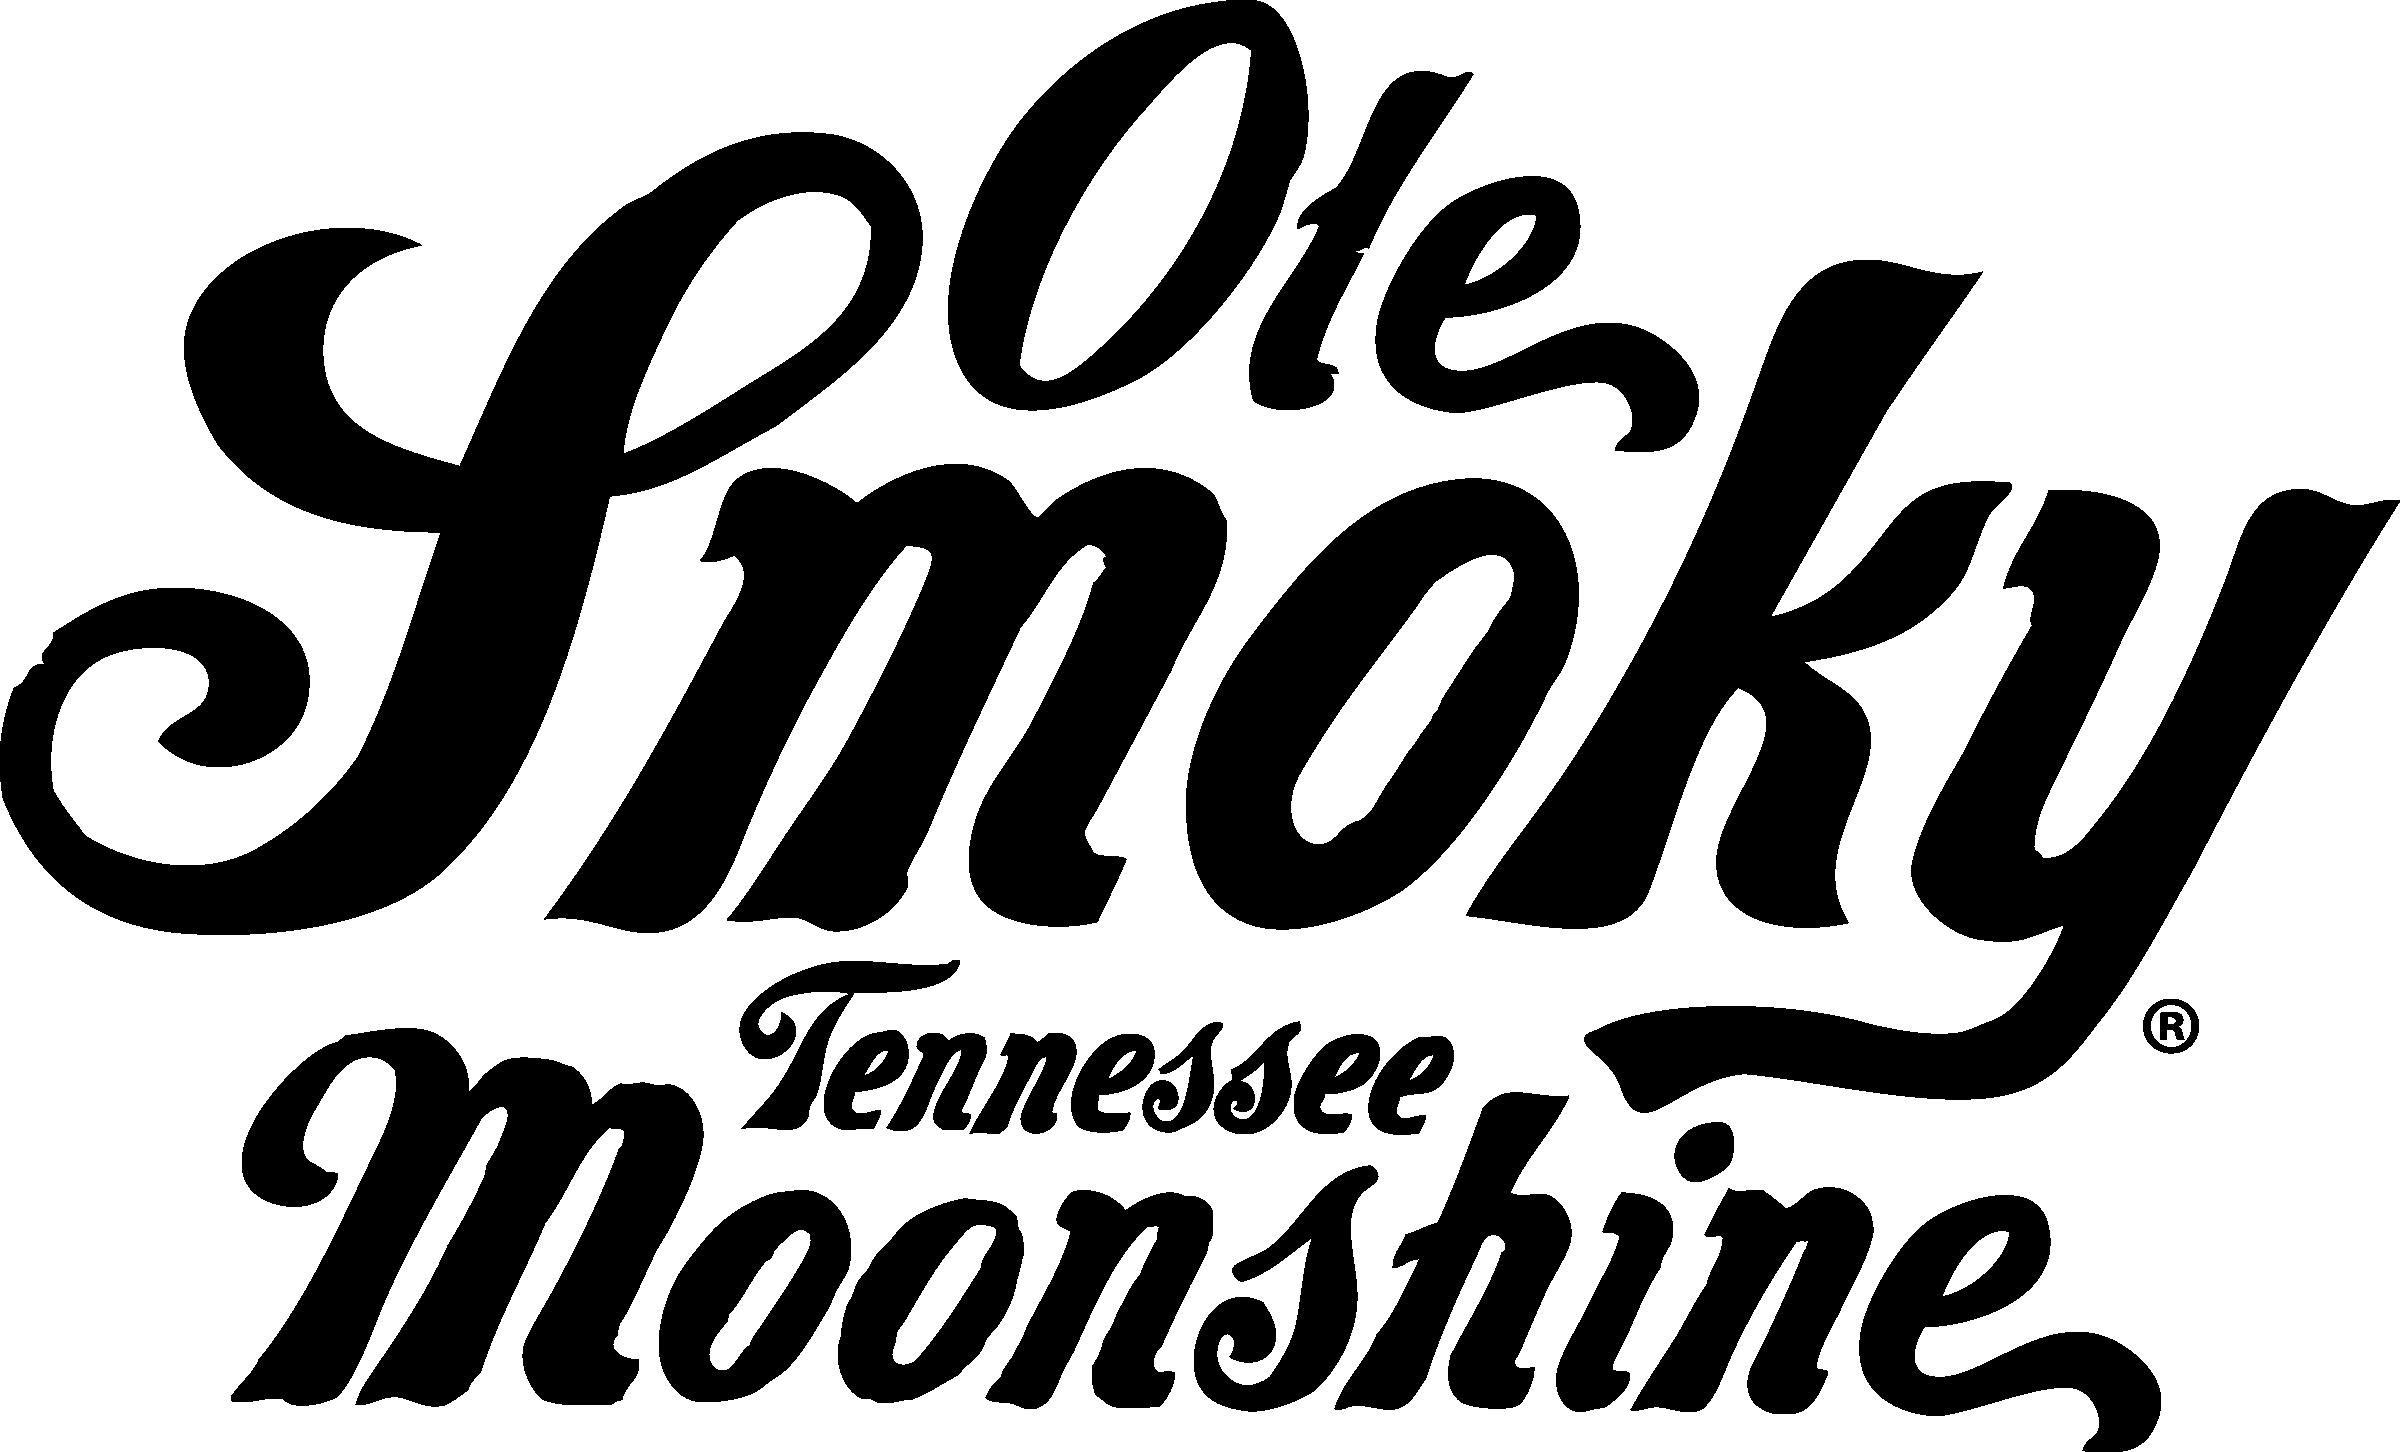 olesmokylargeformatvector2.png (2400×1452)